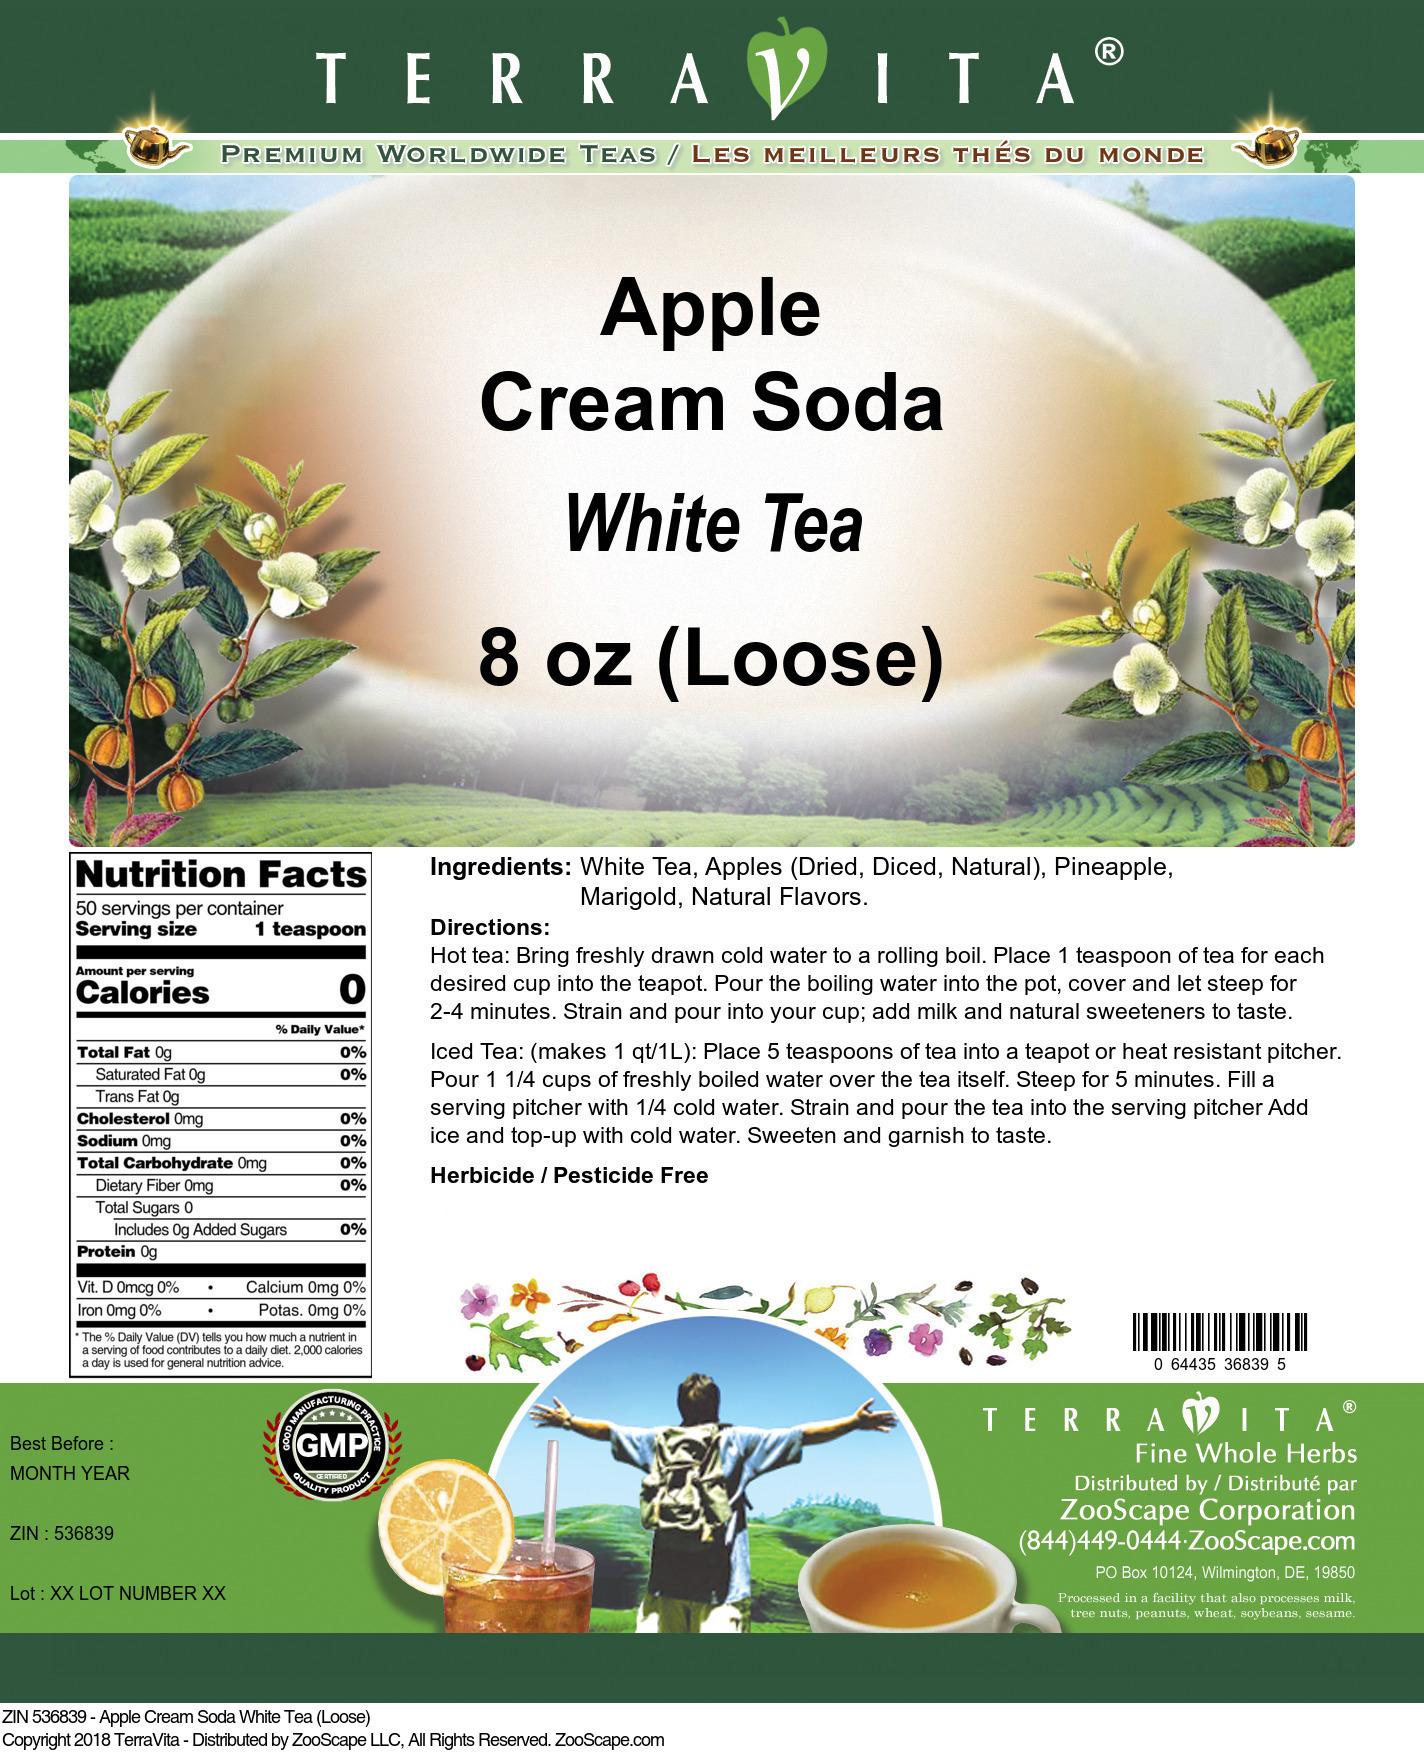 Apple Cream Soda White Tea (Loose)